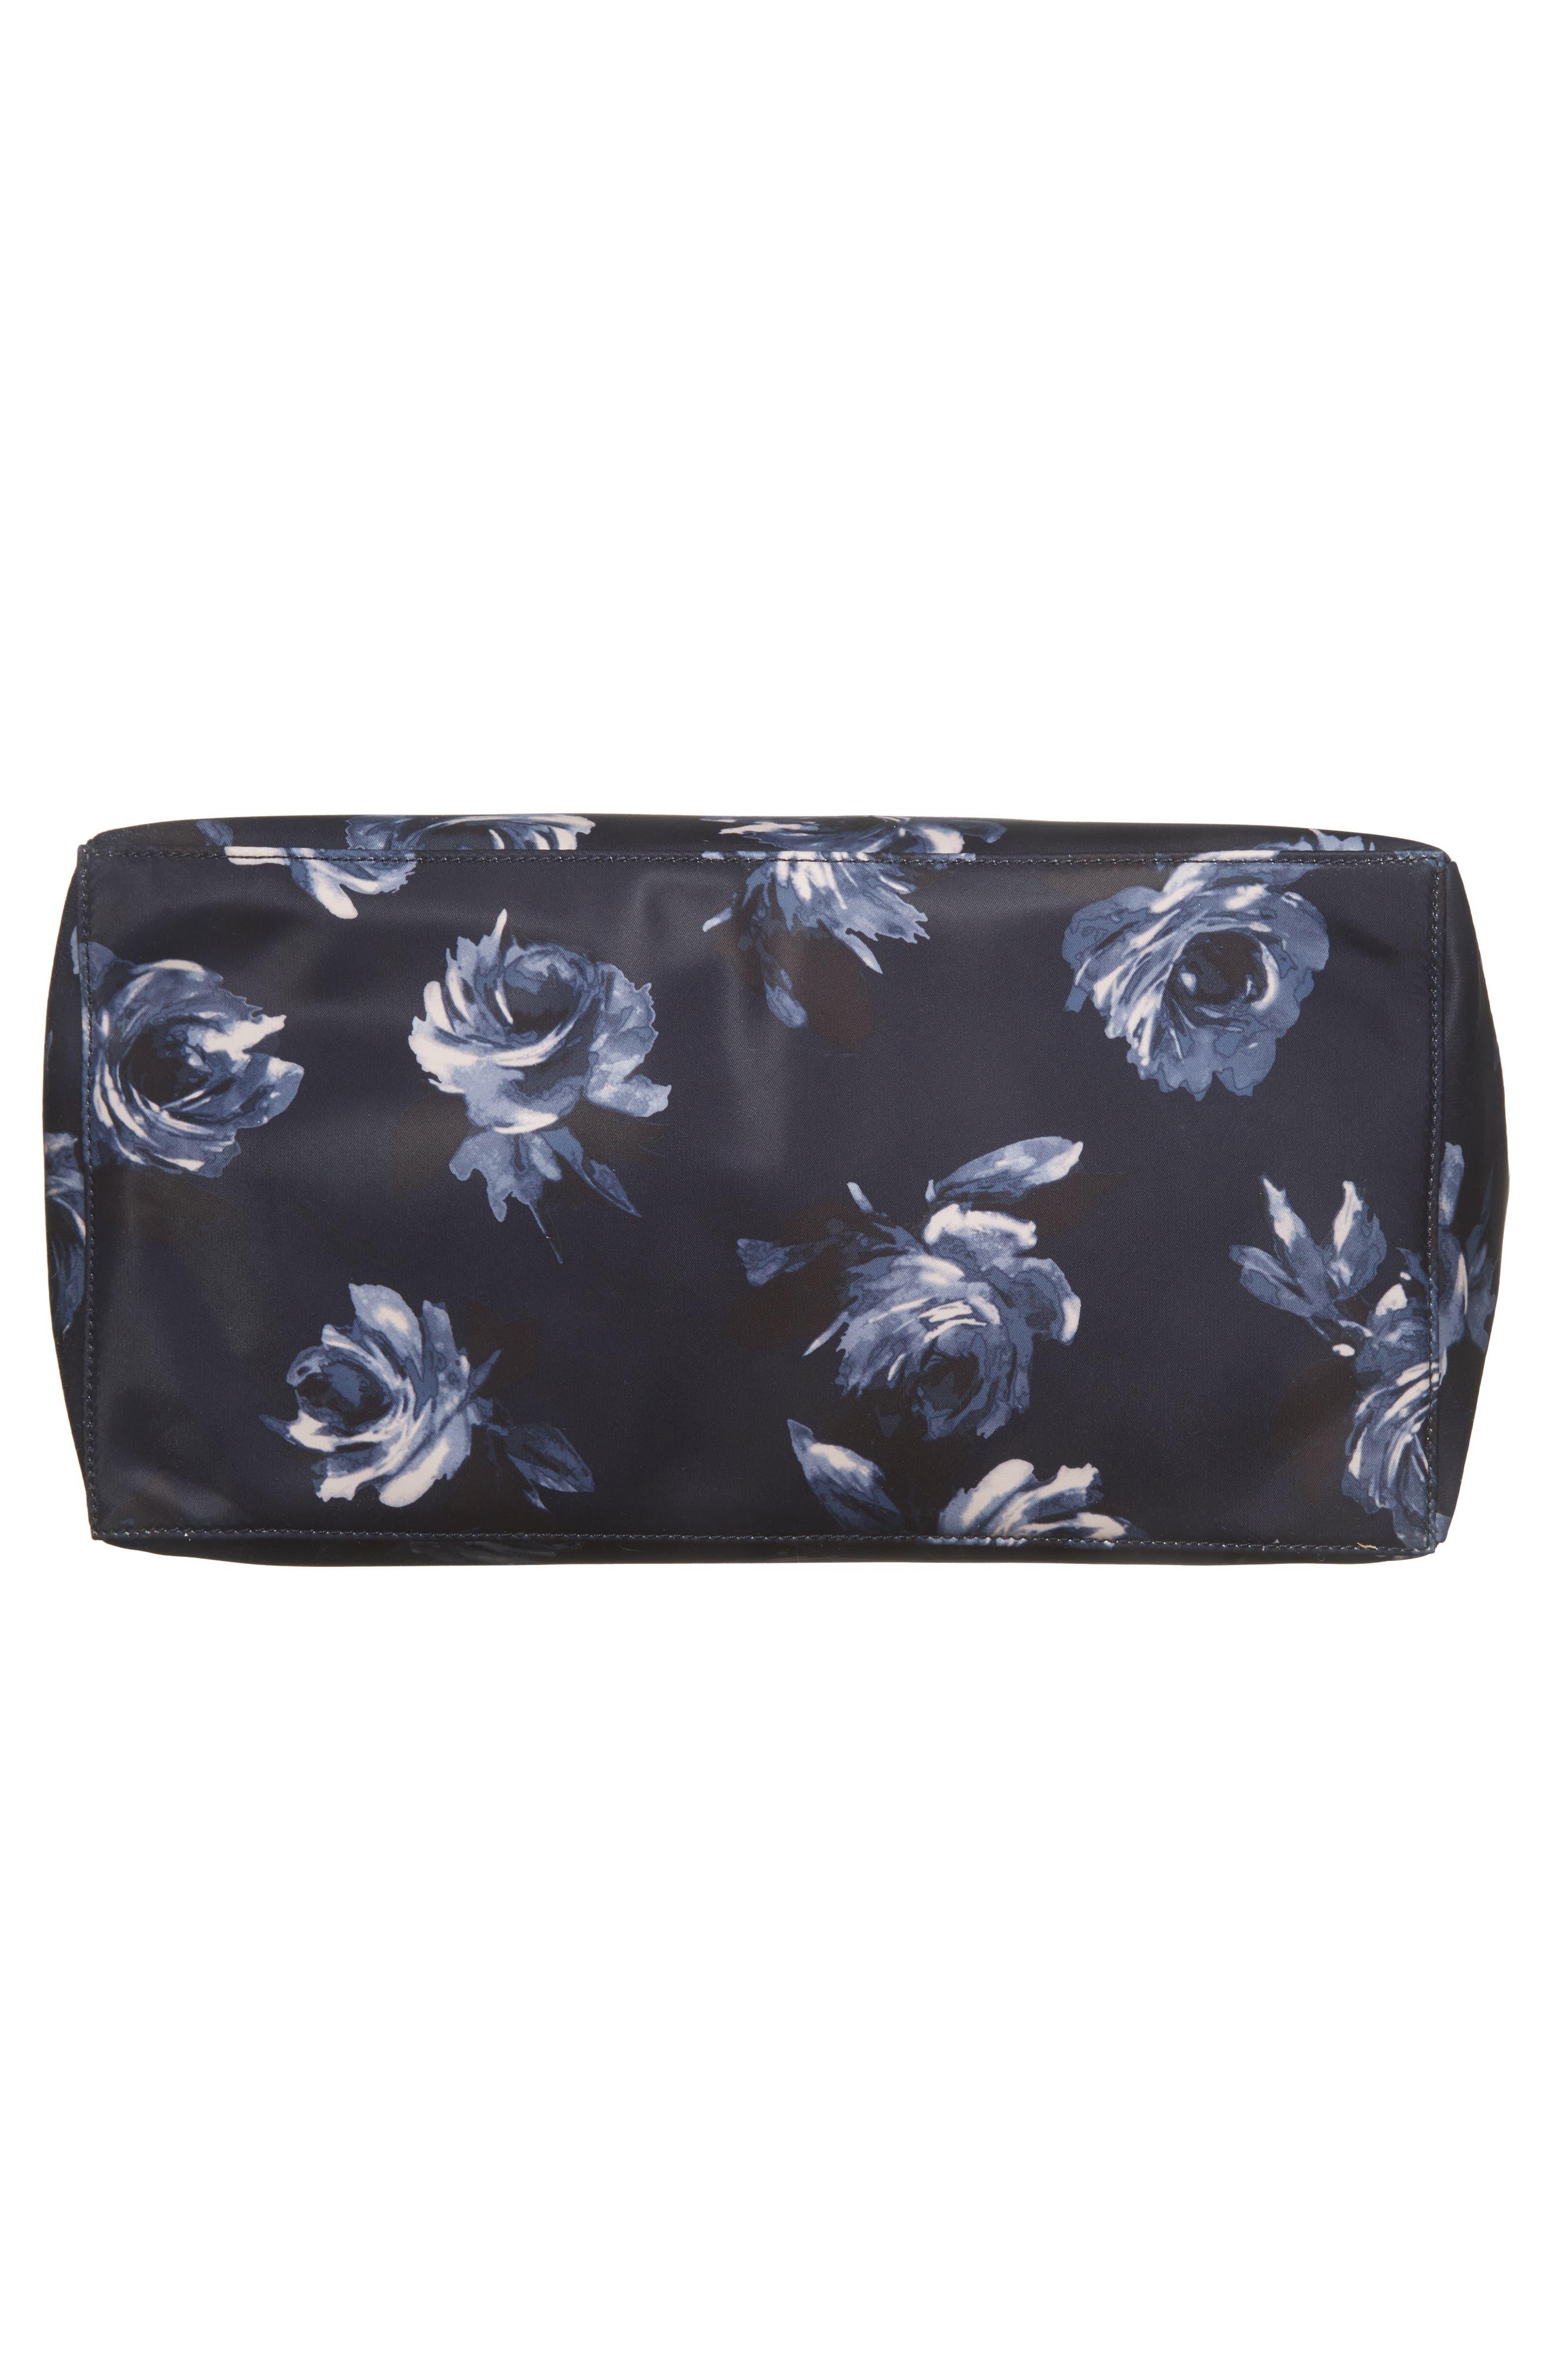 watson lane night rose betheny nylon diaper bag,                             Alternate thumbnail 6, color,                             485